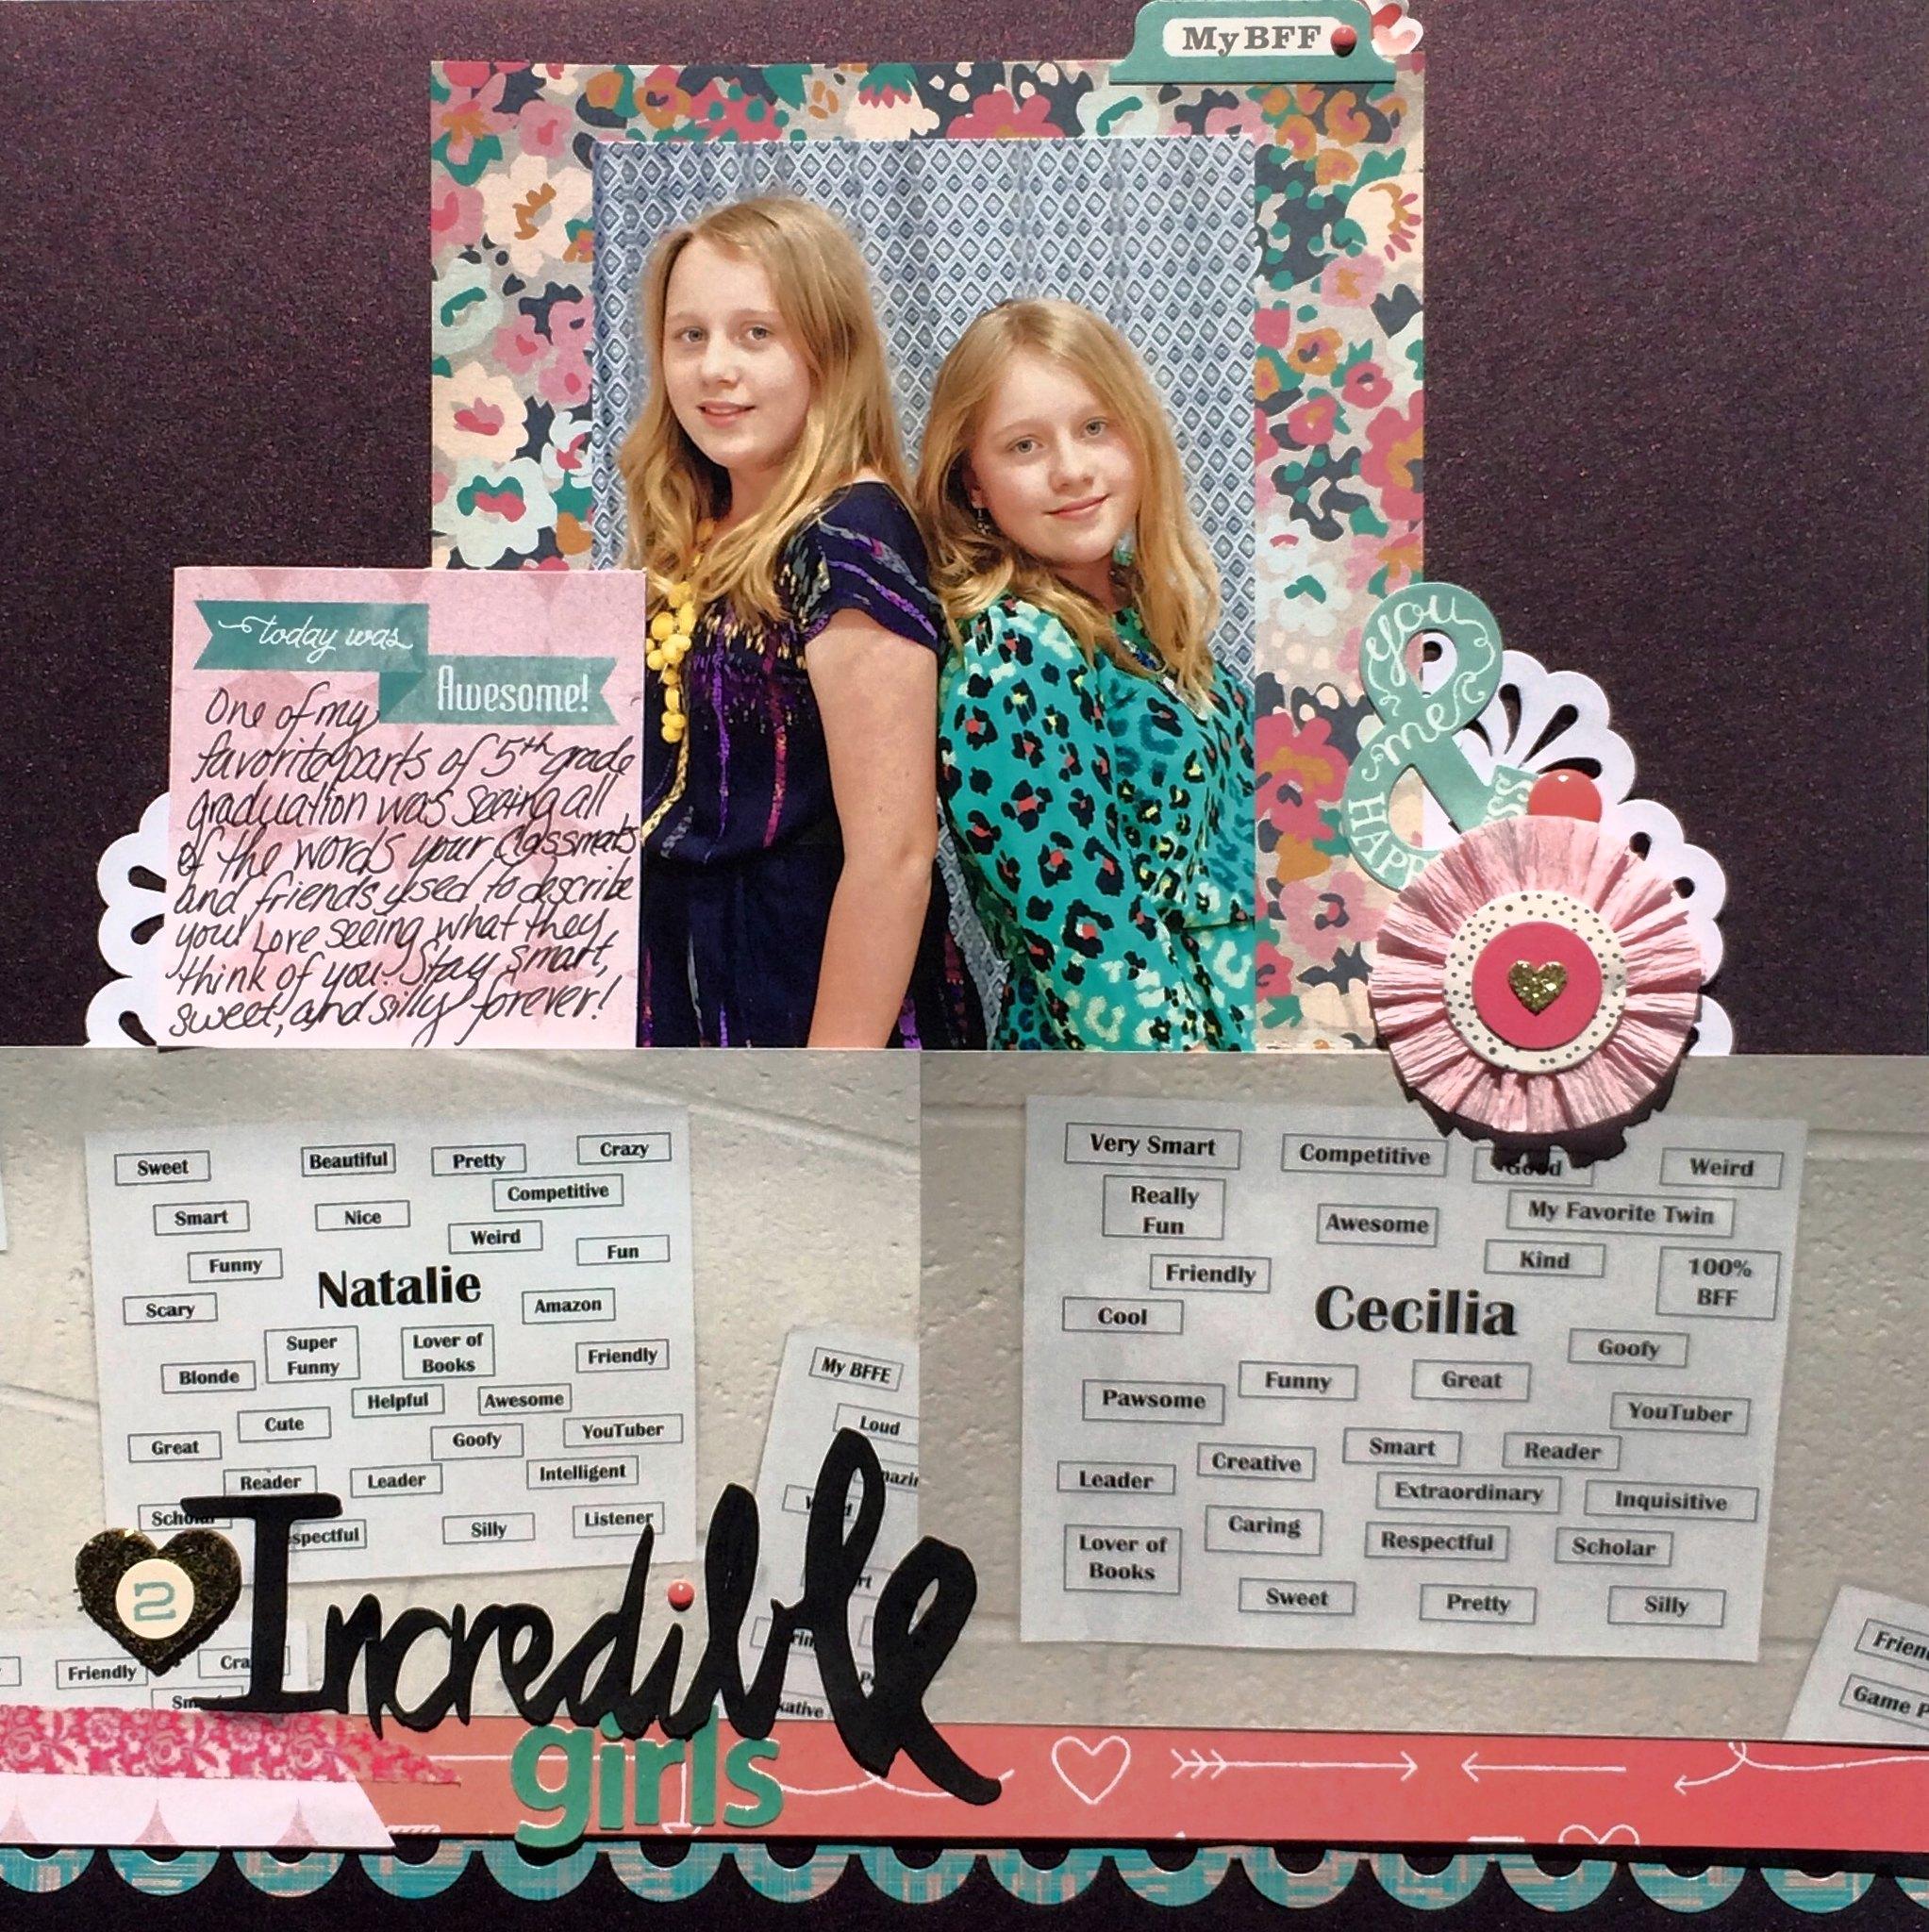 2 Incredible Girls